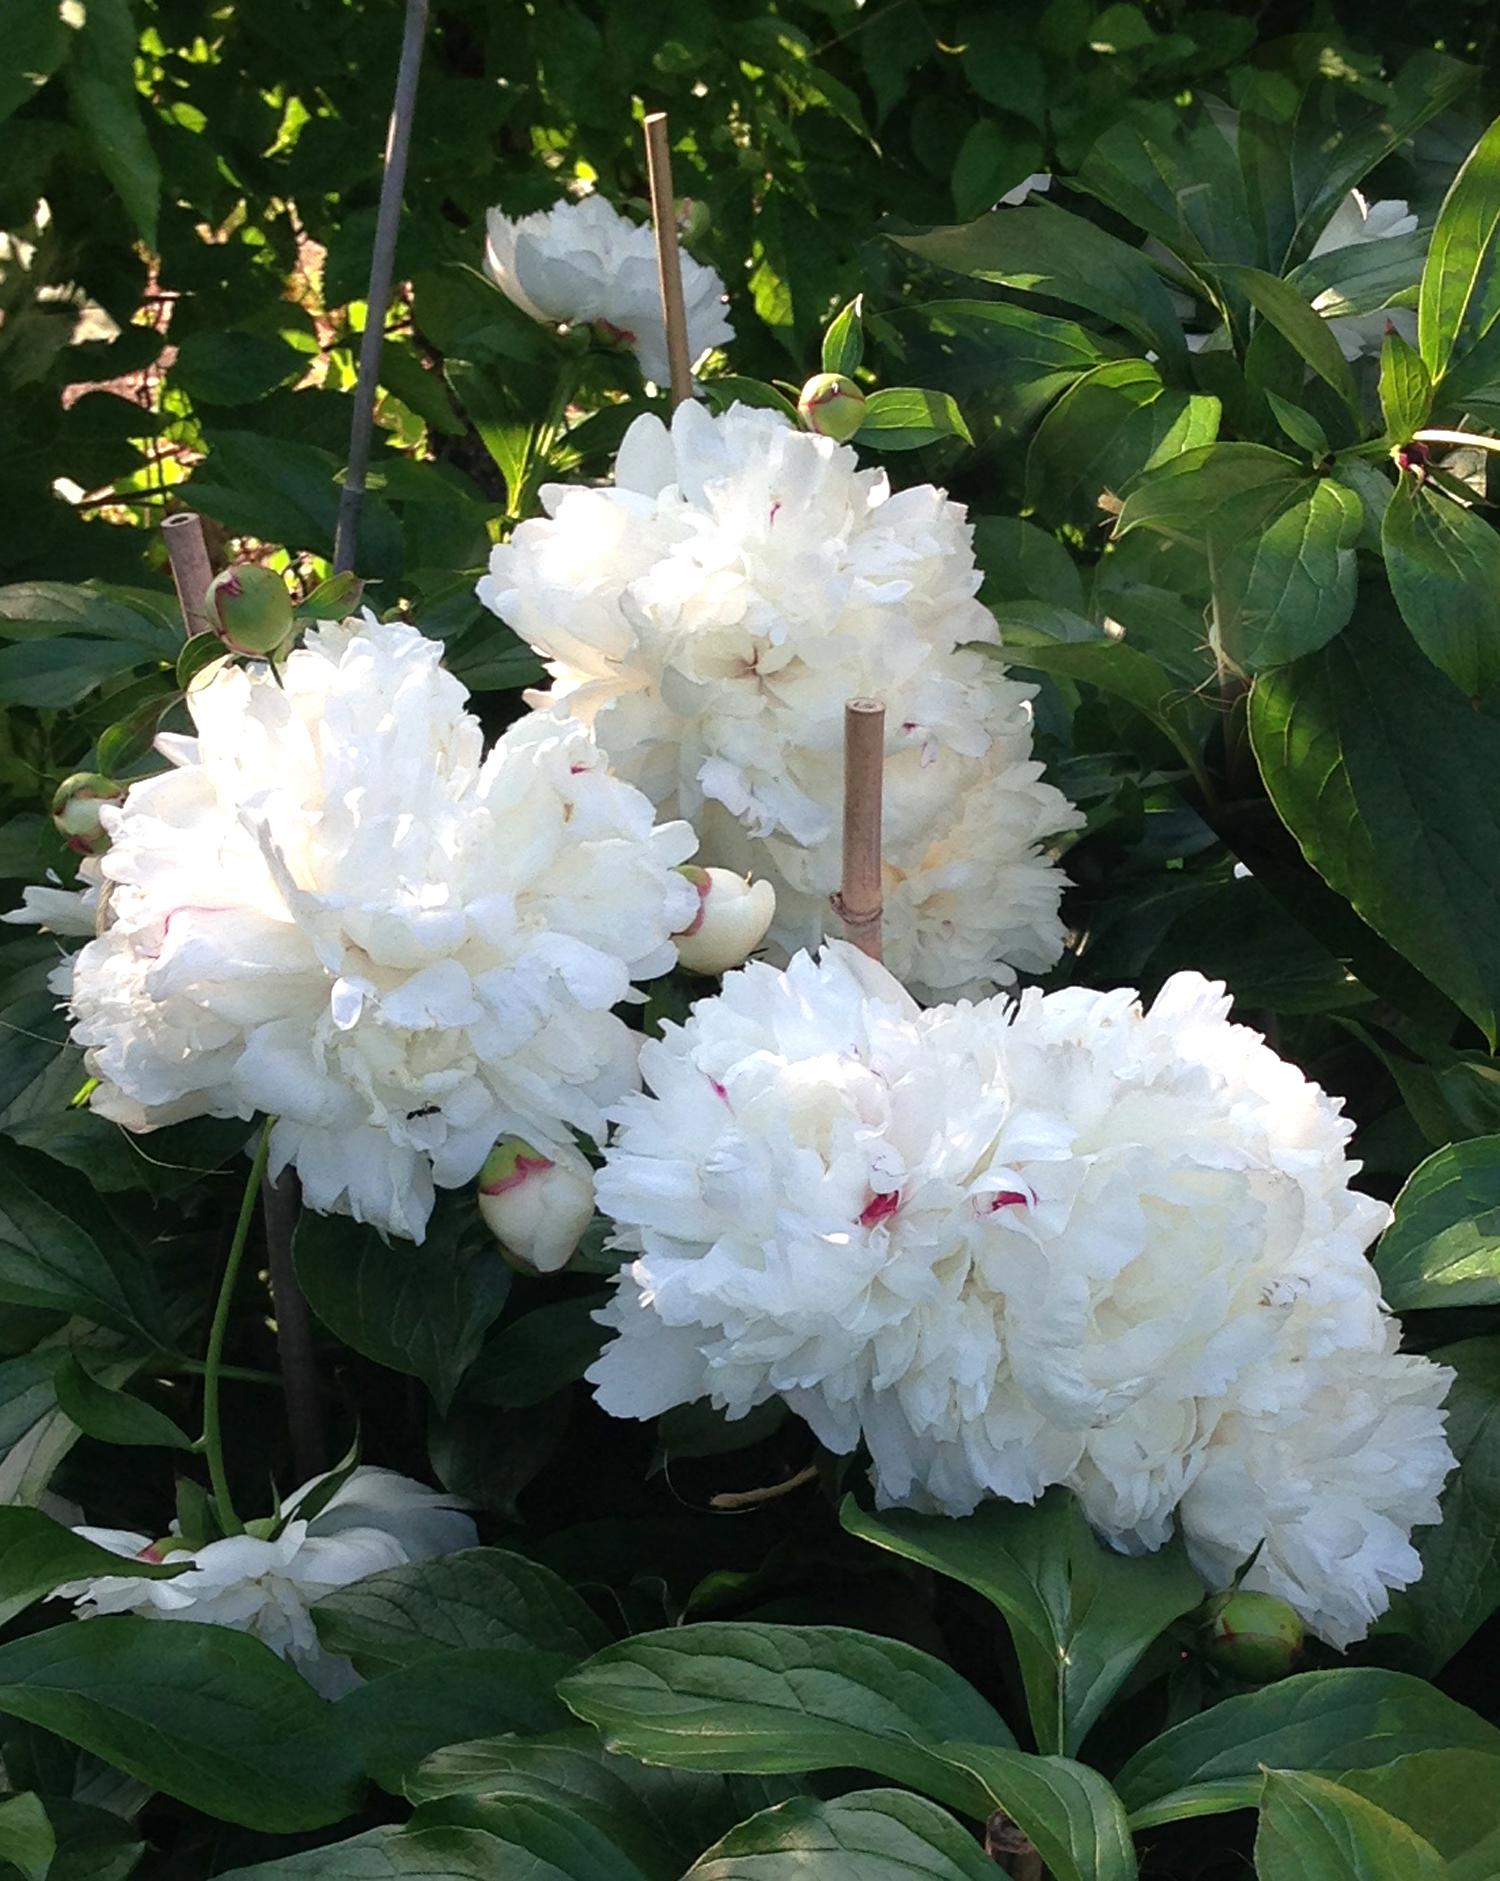 White Peonies in Garden